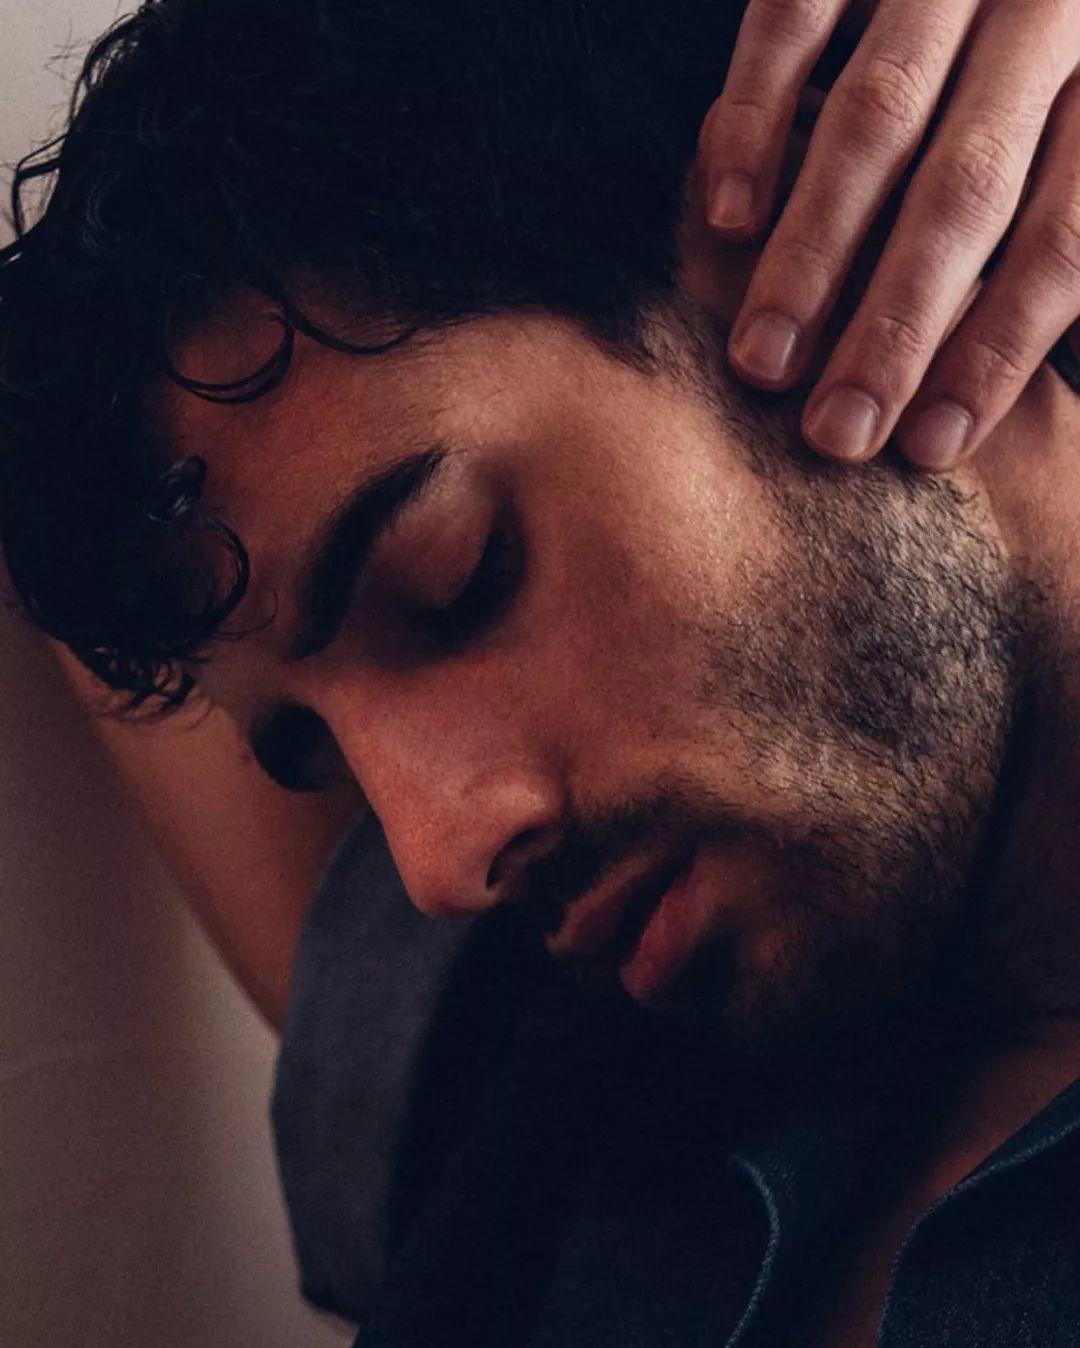 米兰小天使 Riccardo Nardella,可真美!